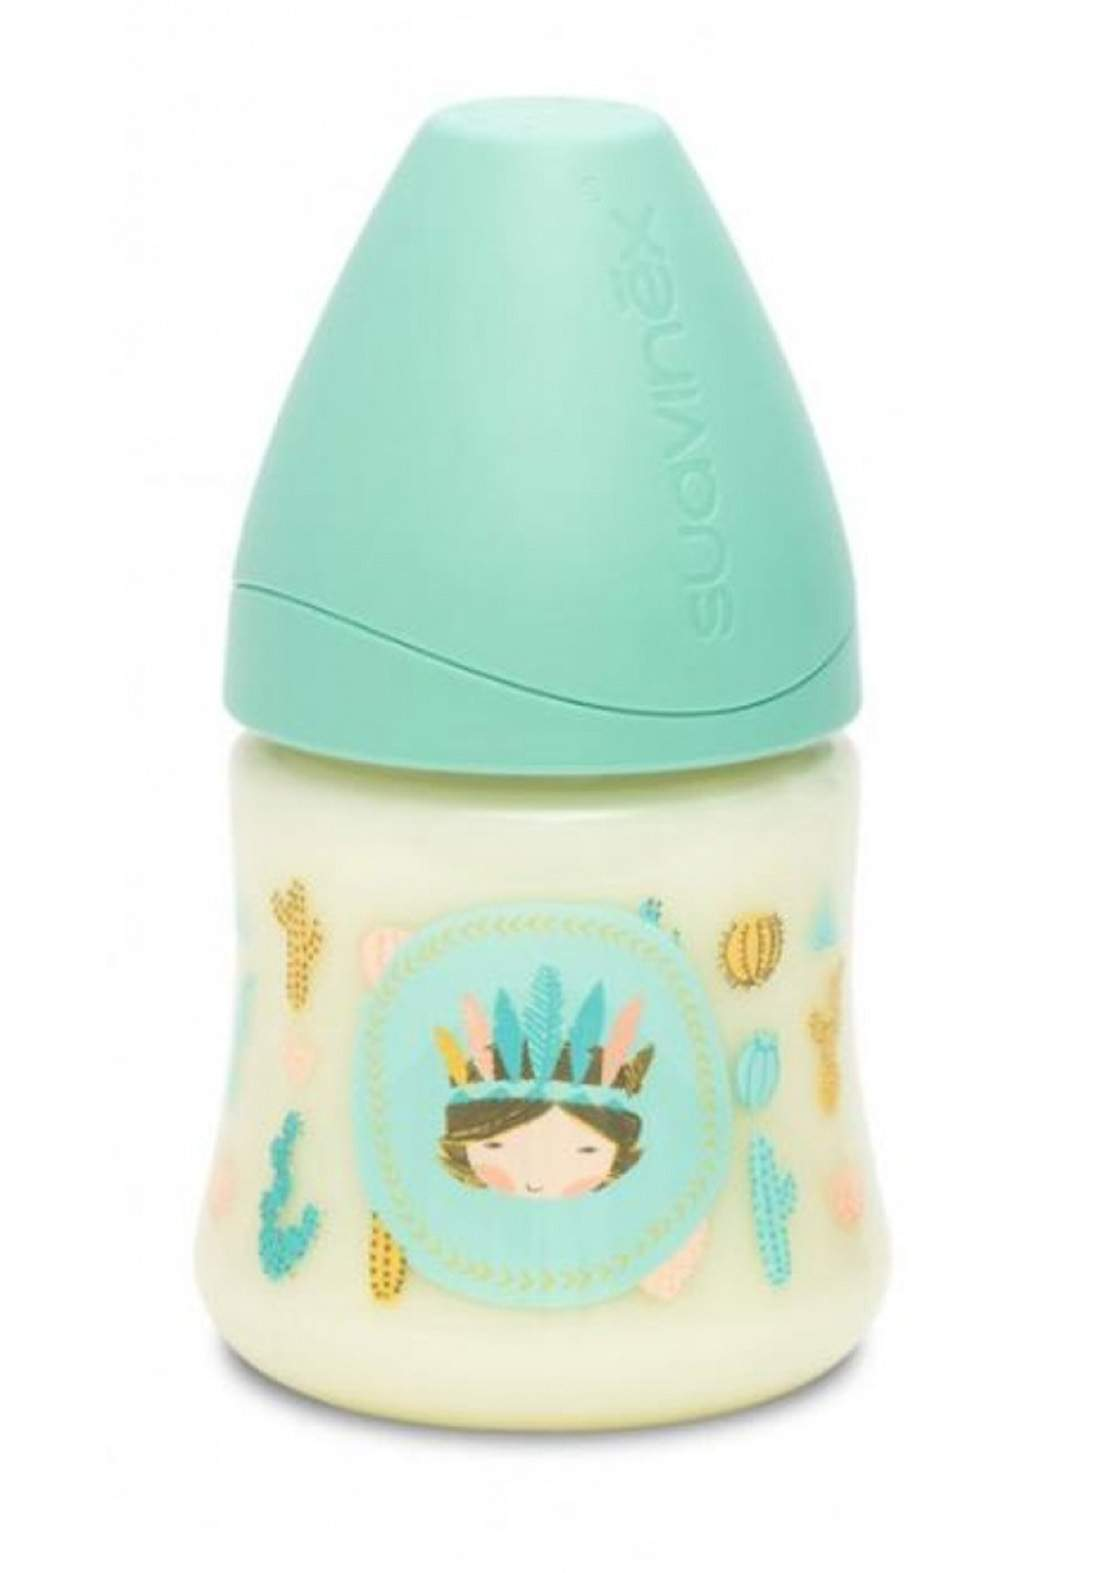 Suavinex Physiological Feeding Bottle 150 ml  رضاعة اطفال